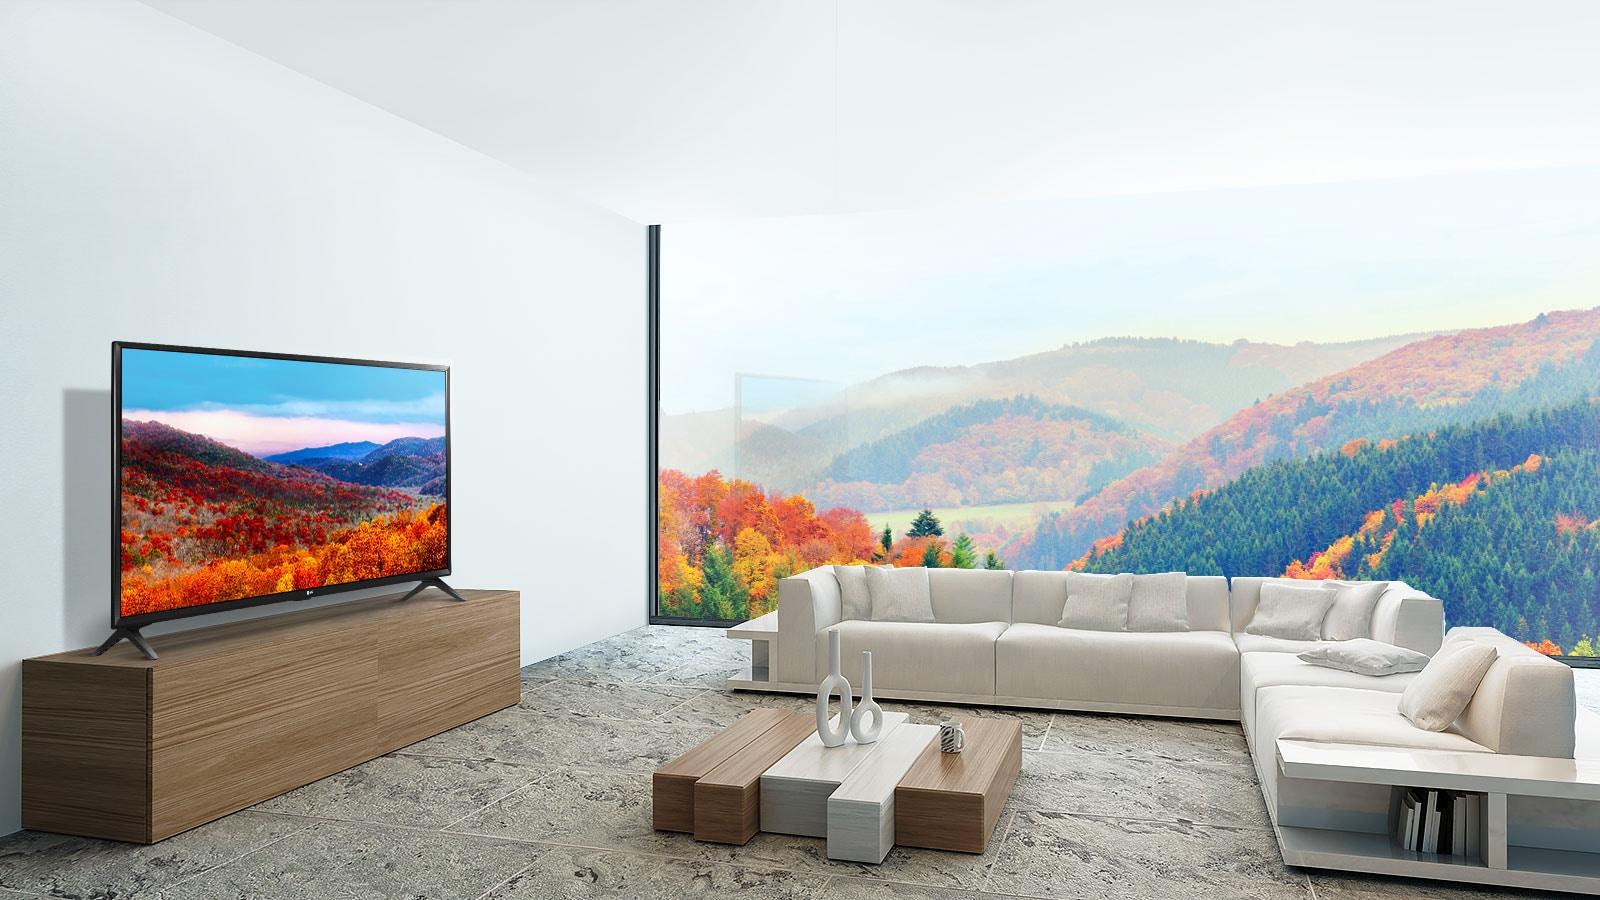 Design TV Modern Black